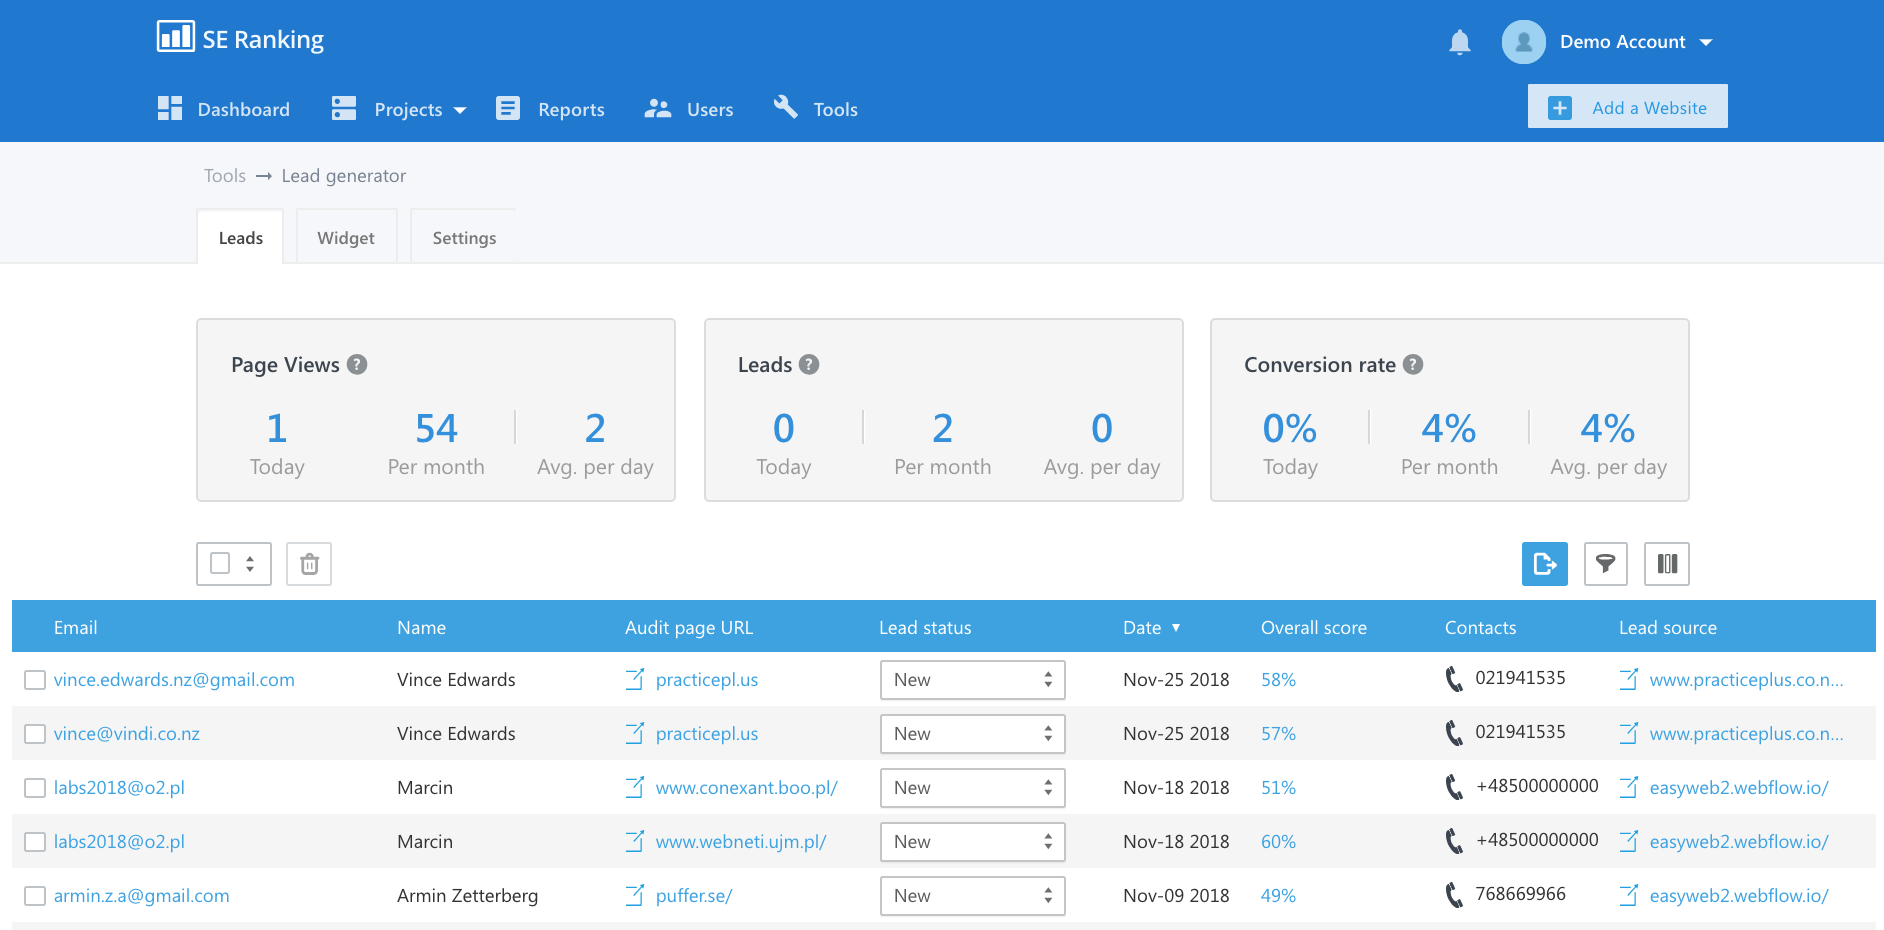 se ranking lead generator tool